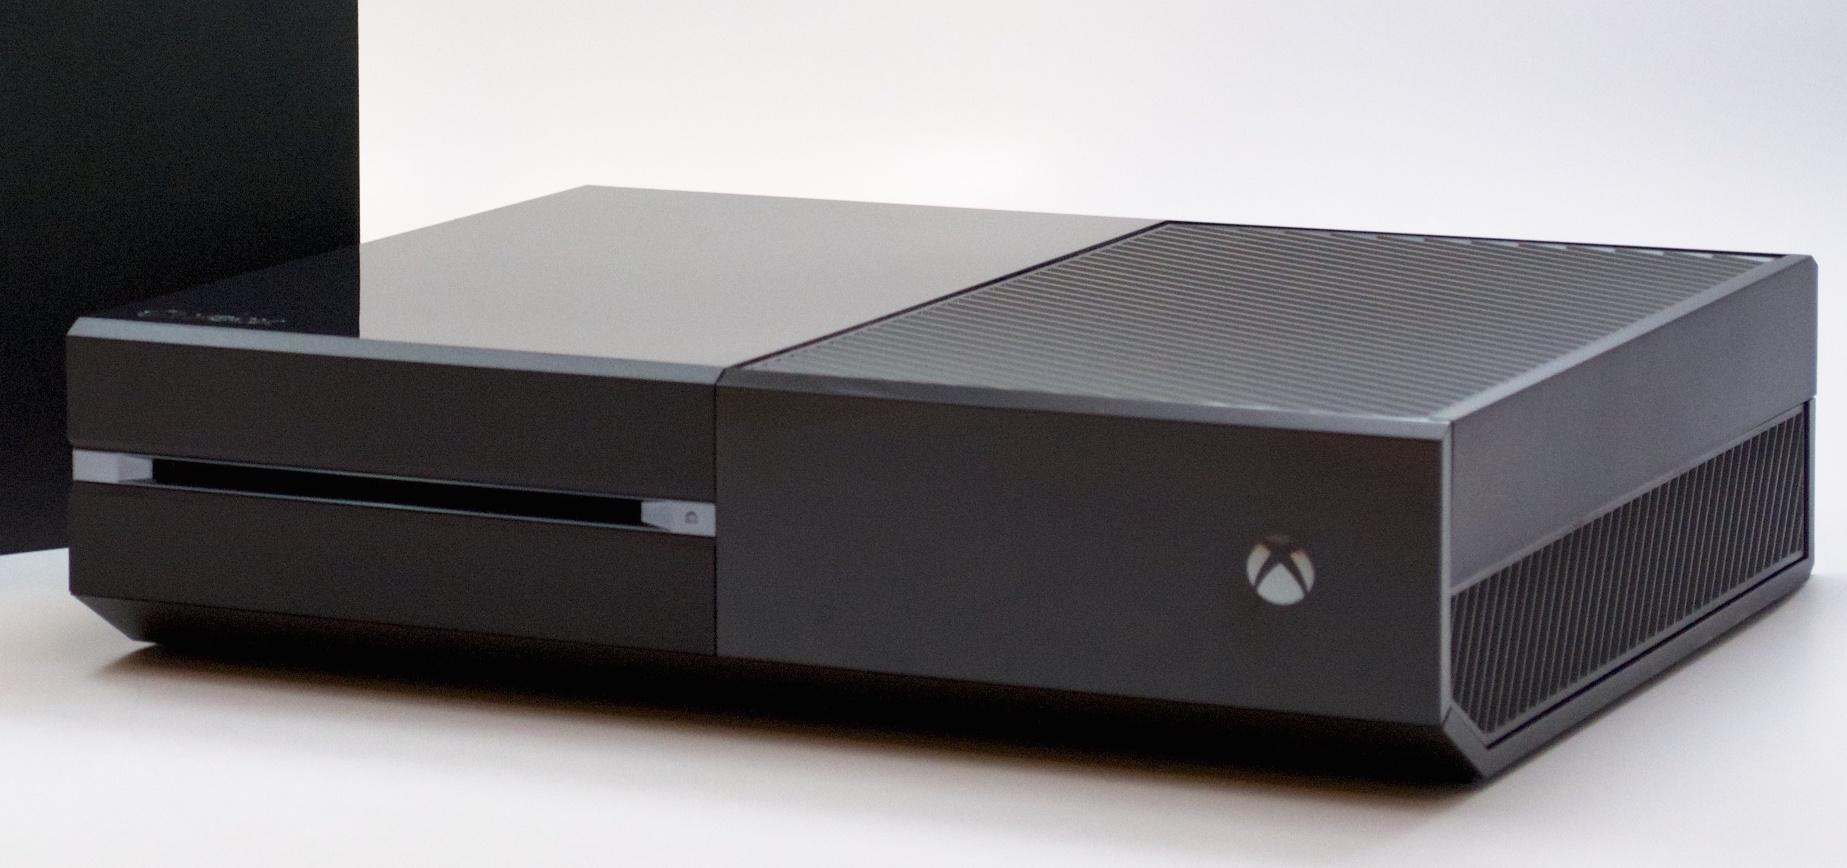 How to Take Screenshots on Xbox One